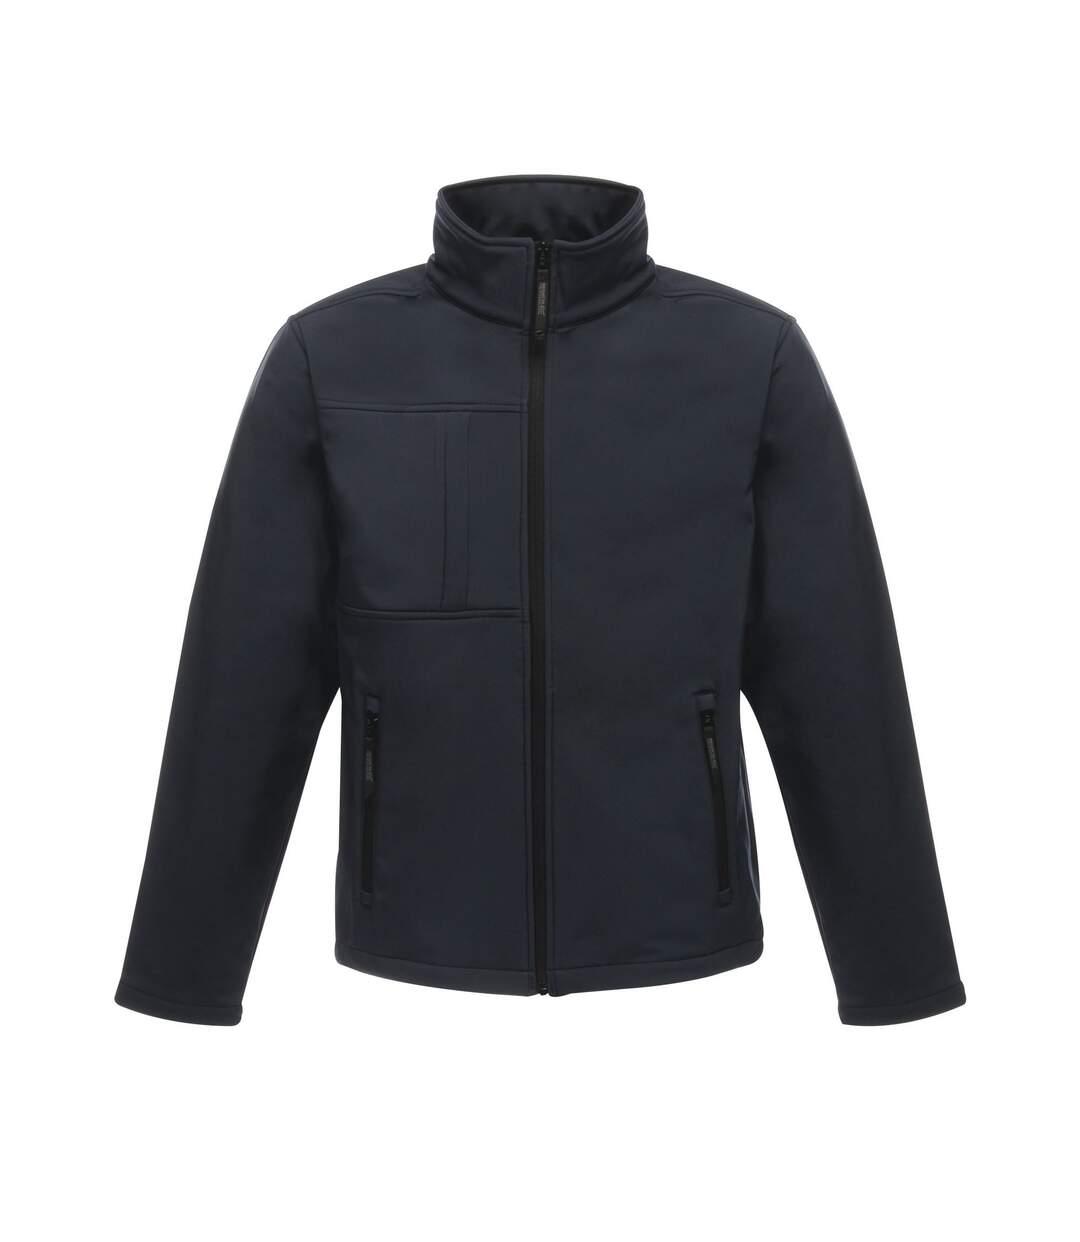 Regatta Professional Mens Octagon II Waterproof Softshell Jacket (Navy/Seal Grey) - UTRG2164